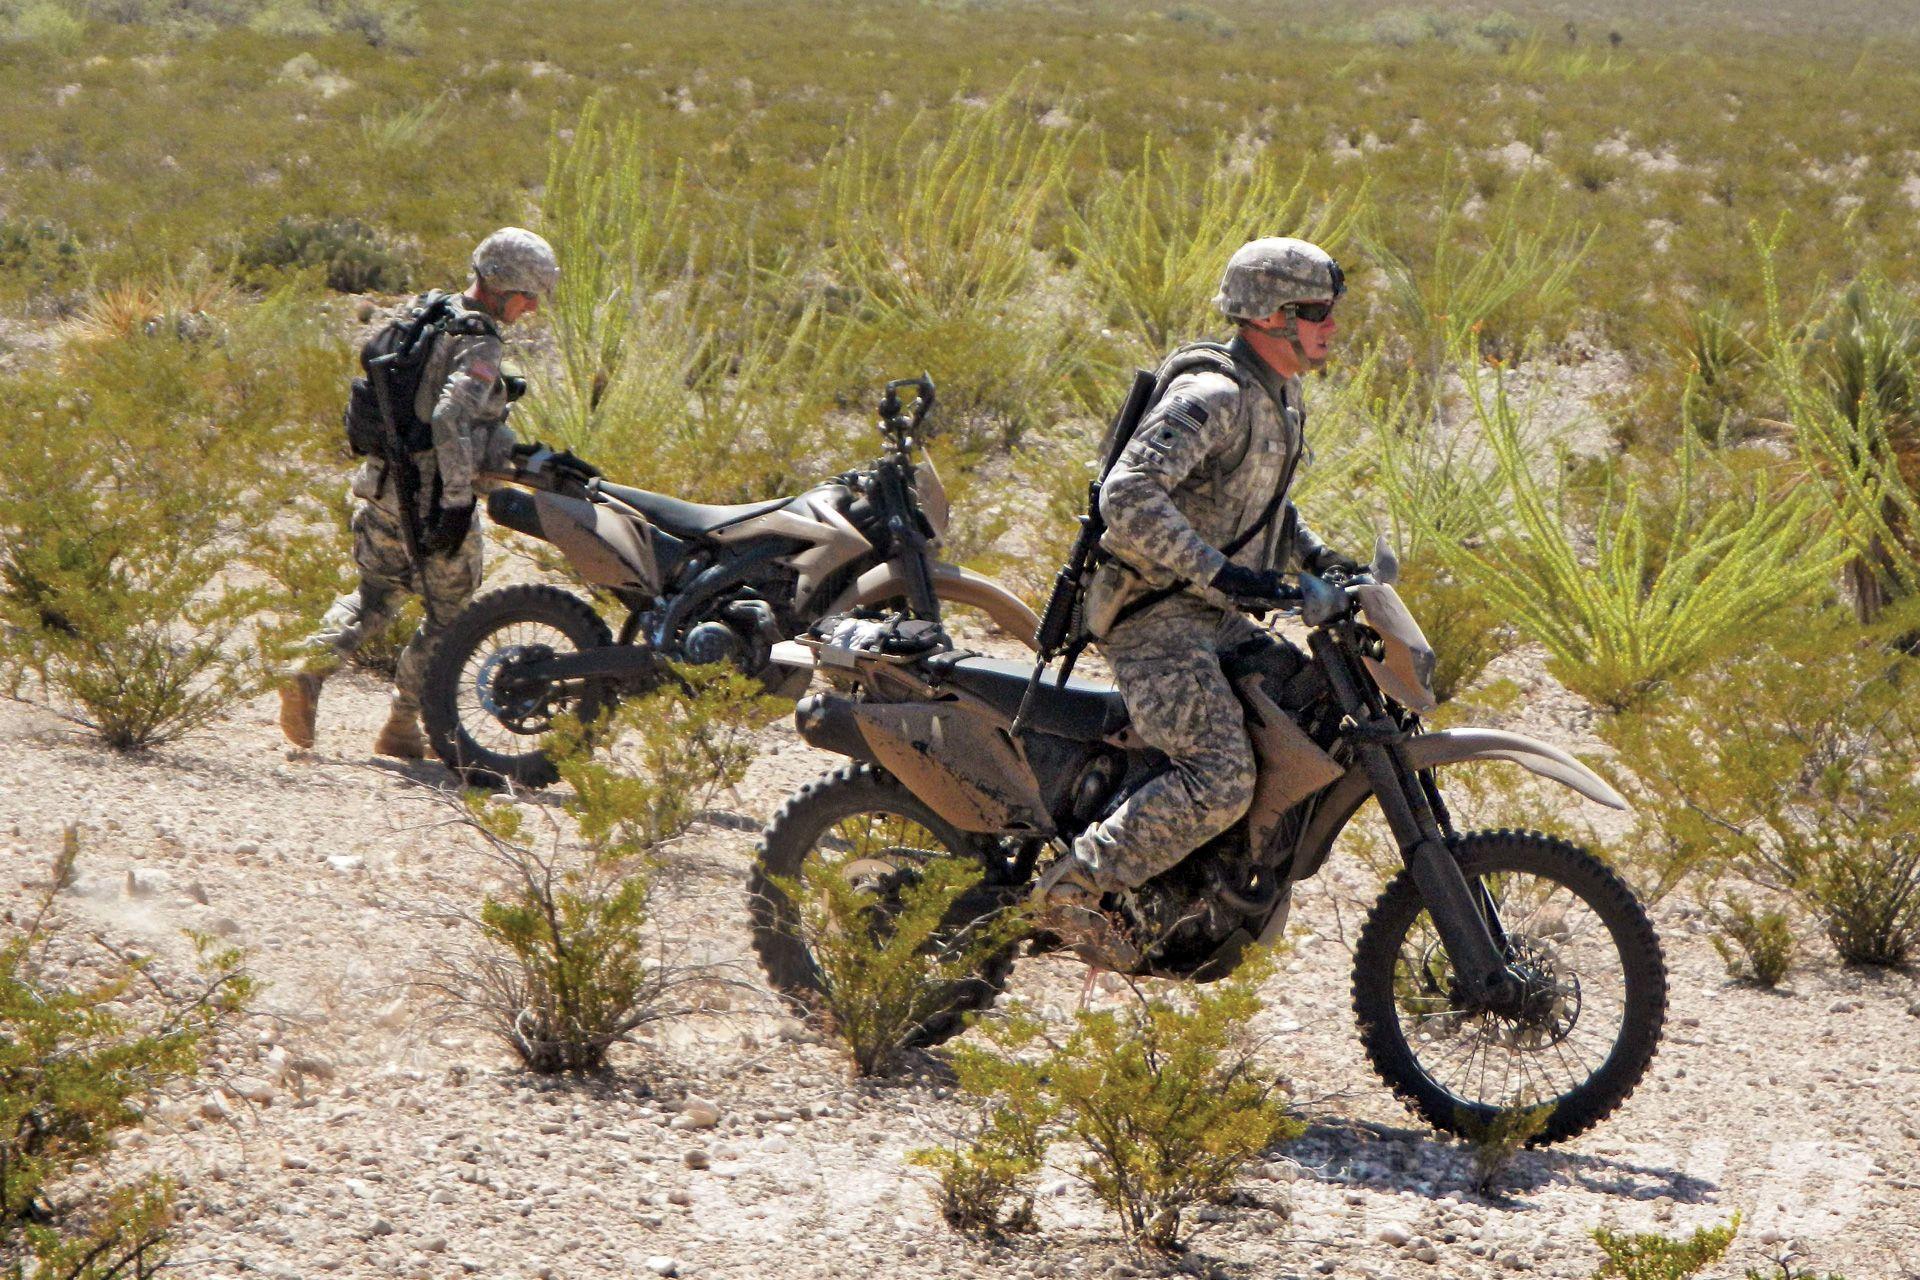 Innovative Awd Motorcycle On Patrol In Afghanistan